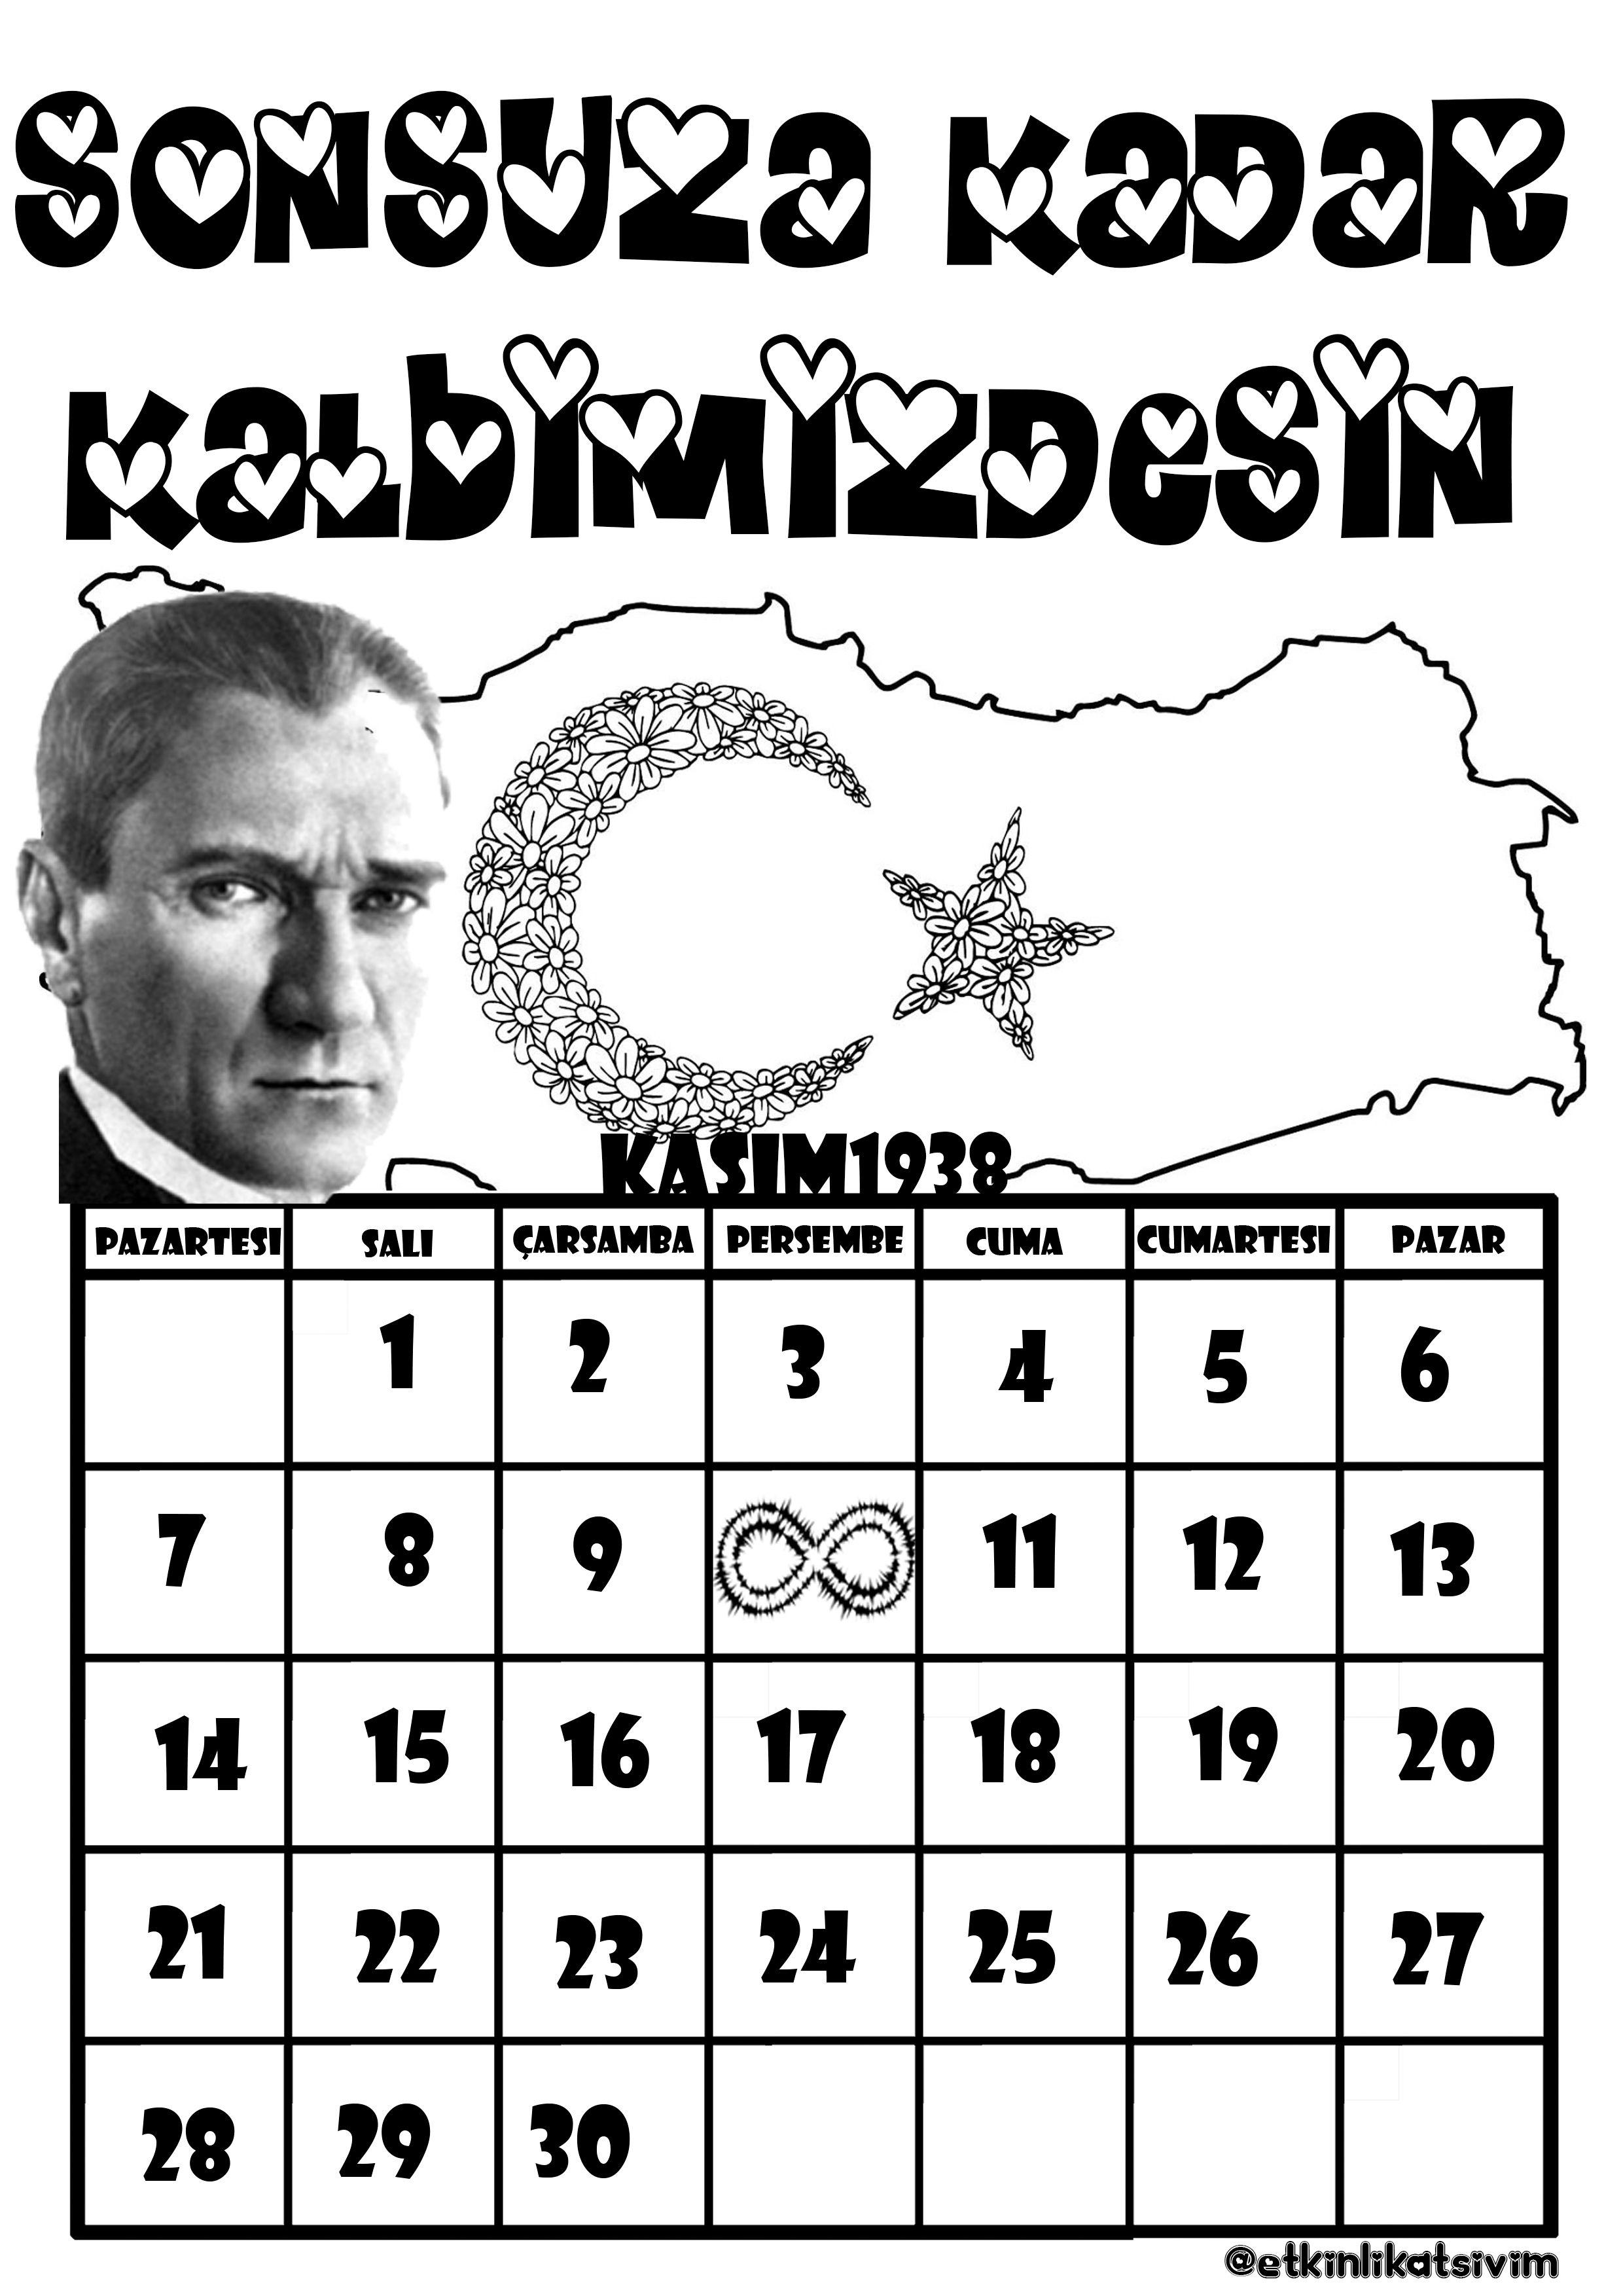 10 Kasim Okul Oncesi 10 Kasim Etkinlikleri Ataturk Rozeti Ataturk U Anma 10 Kasim Pano Ornekleri Ataturk Kosesi Ataturk Ataturk Okul Okul Oncesi